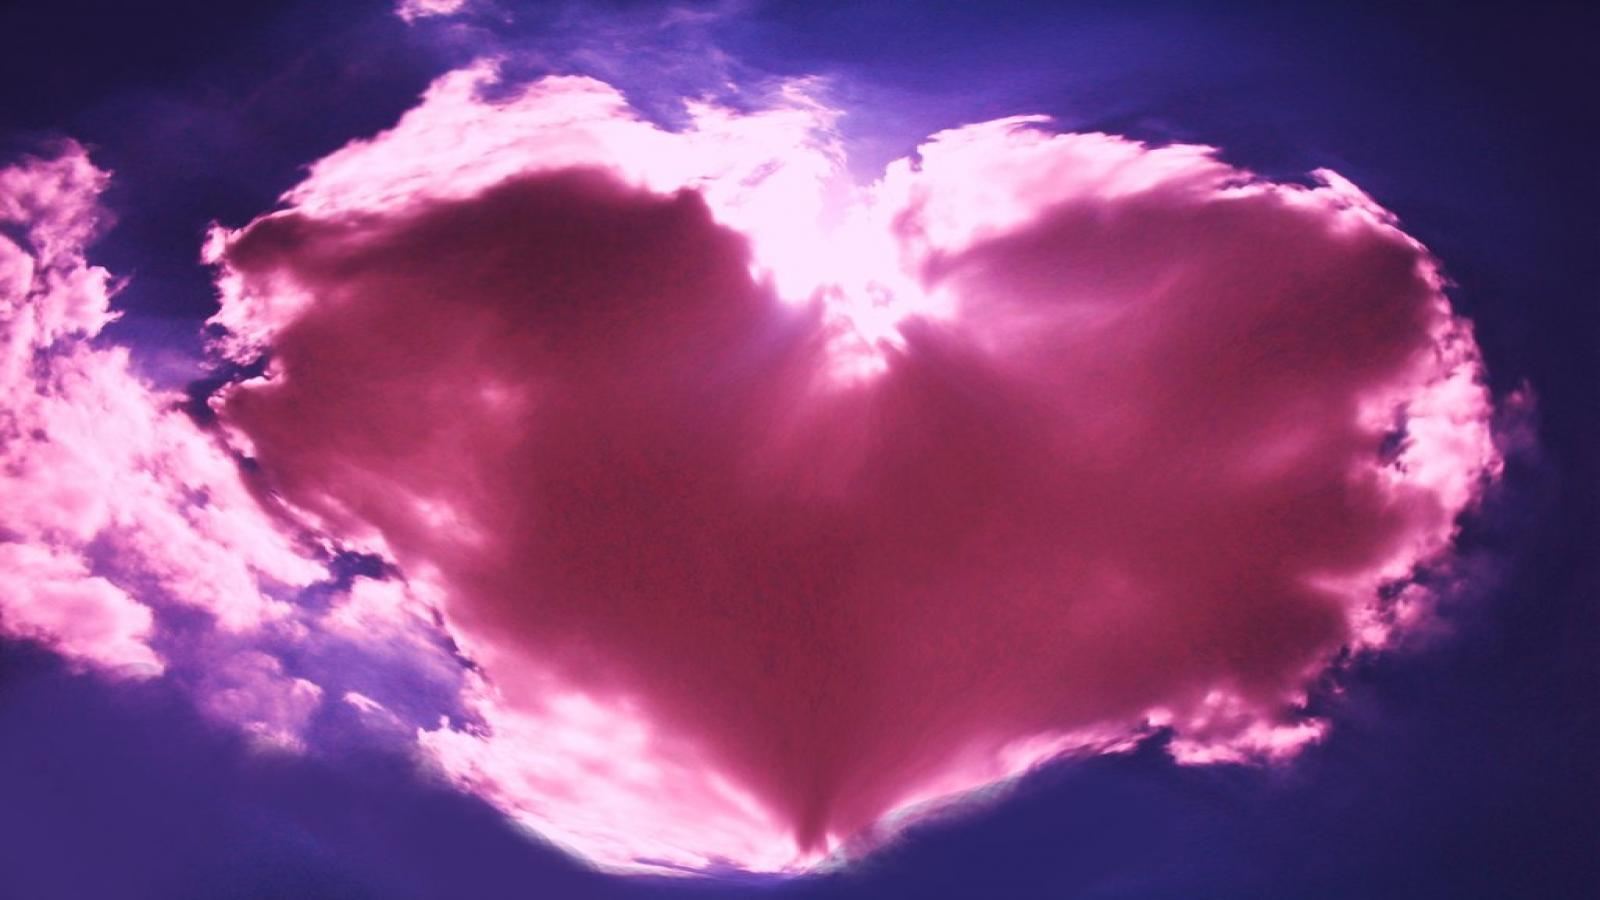 image de coeur nuage rose en forme de coeur. Black Bedroom Furniture Sets. Home Design Ideas